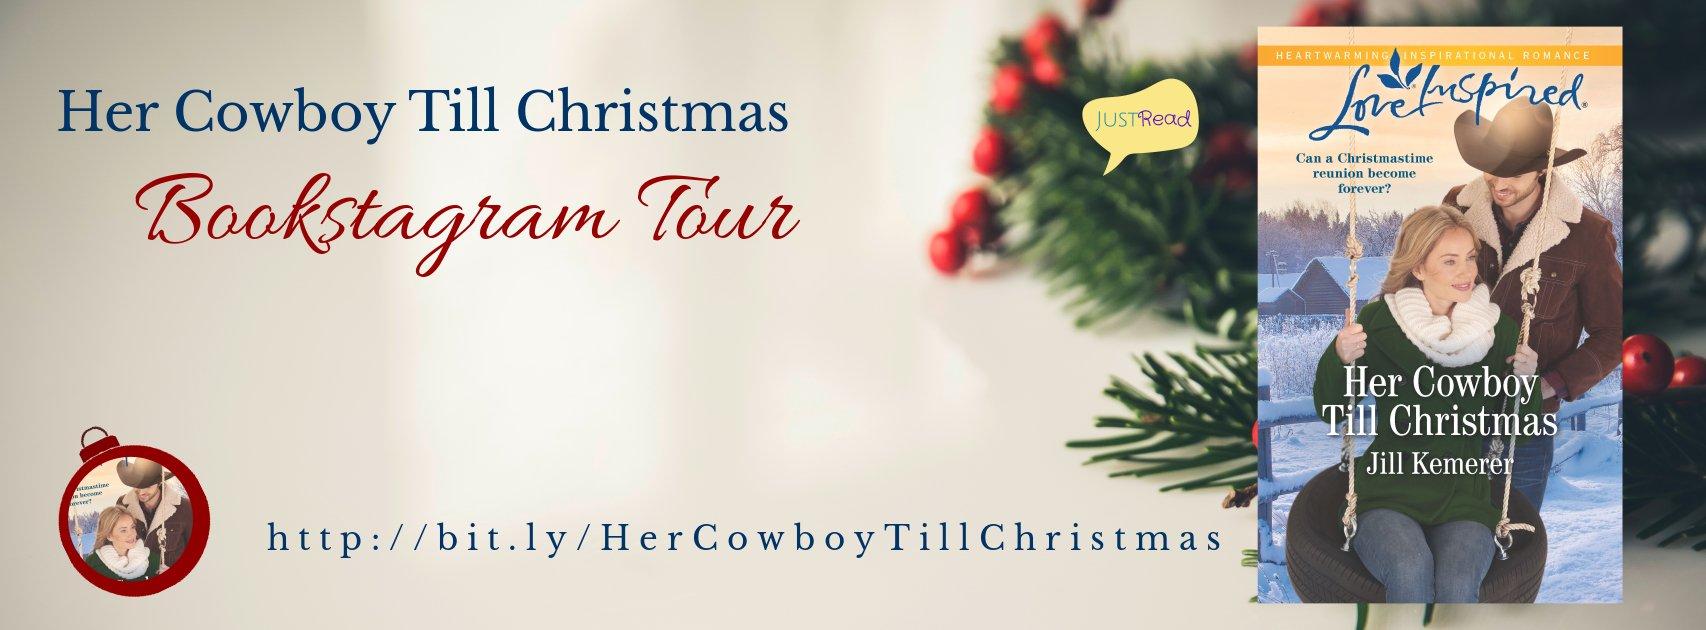 Her Cowboy Till Christmas JustRead Bookstagram Tour